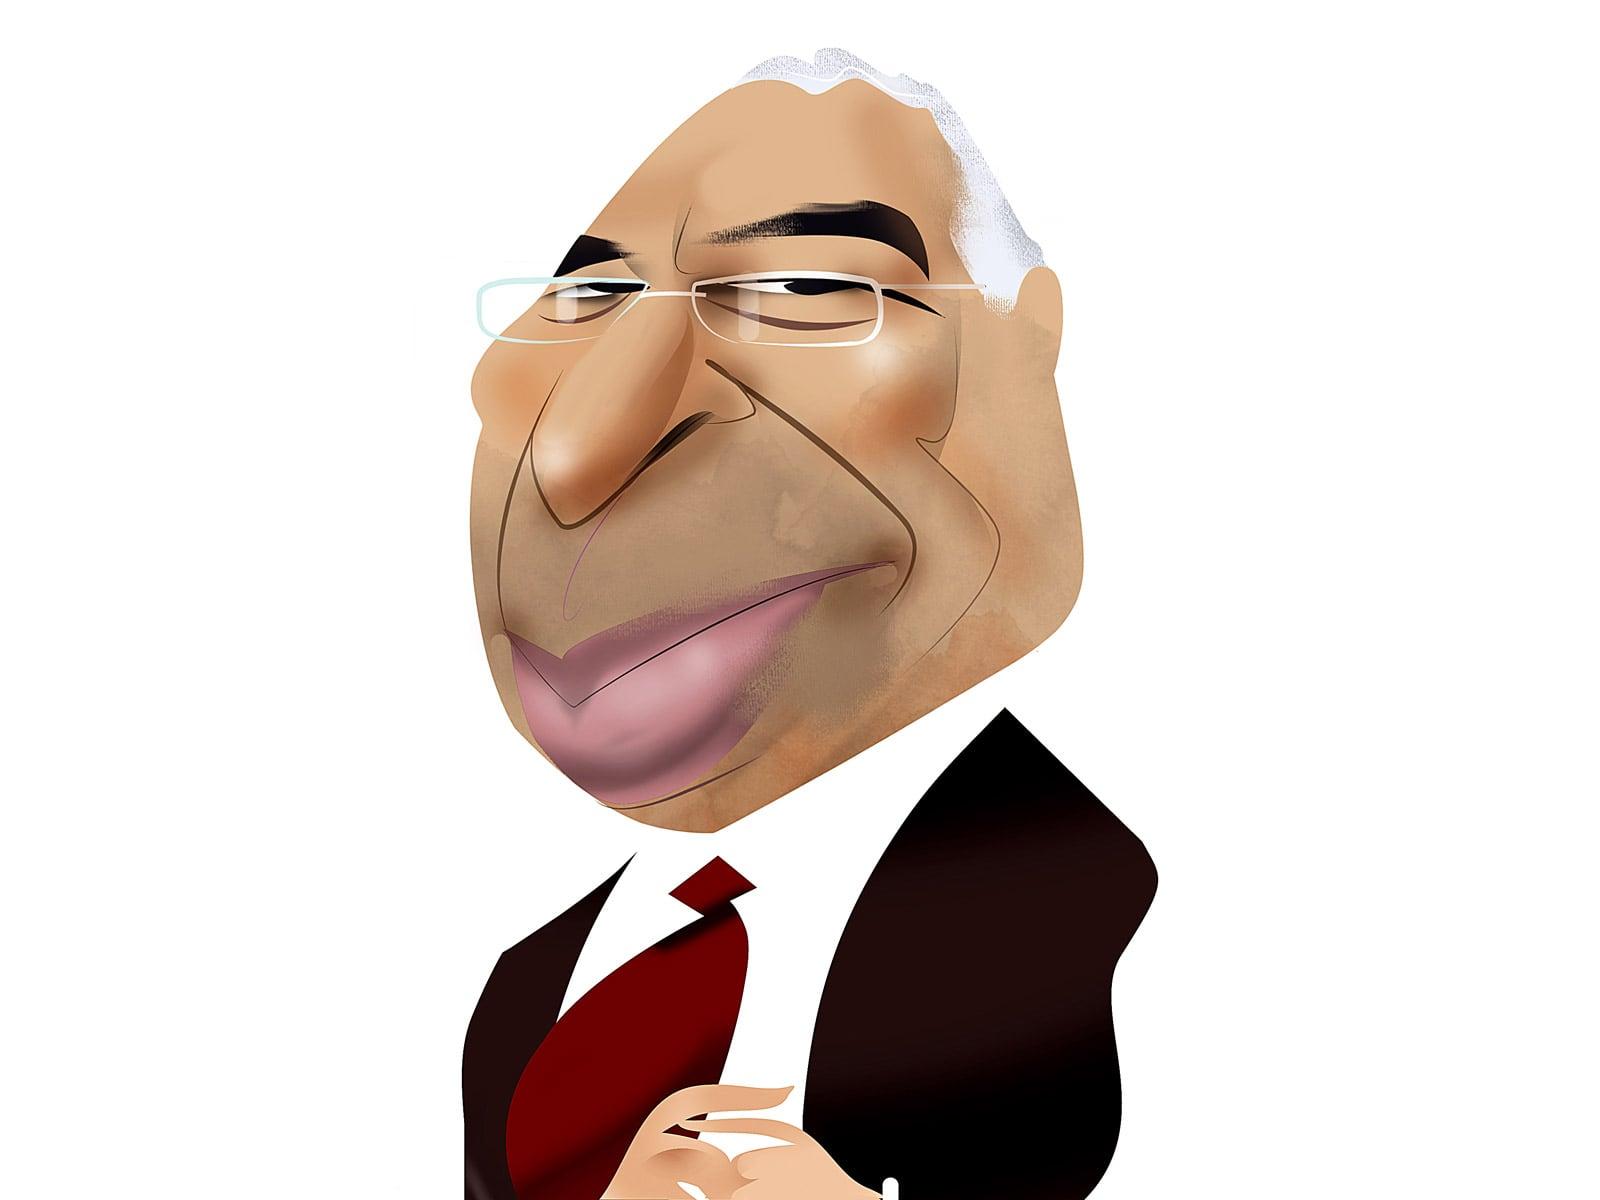 António Costa. Caricatura de Luis Grañena.